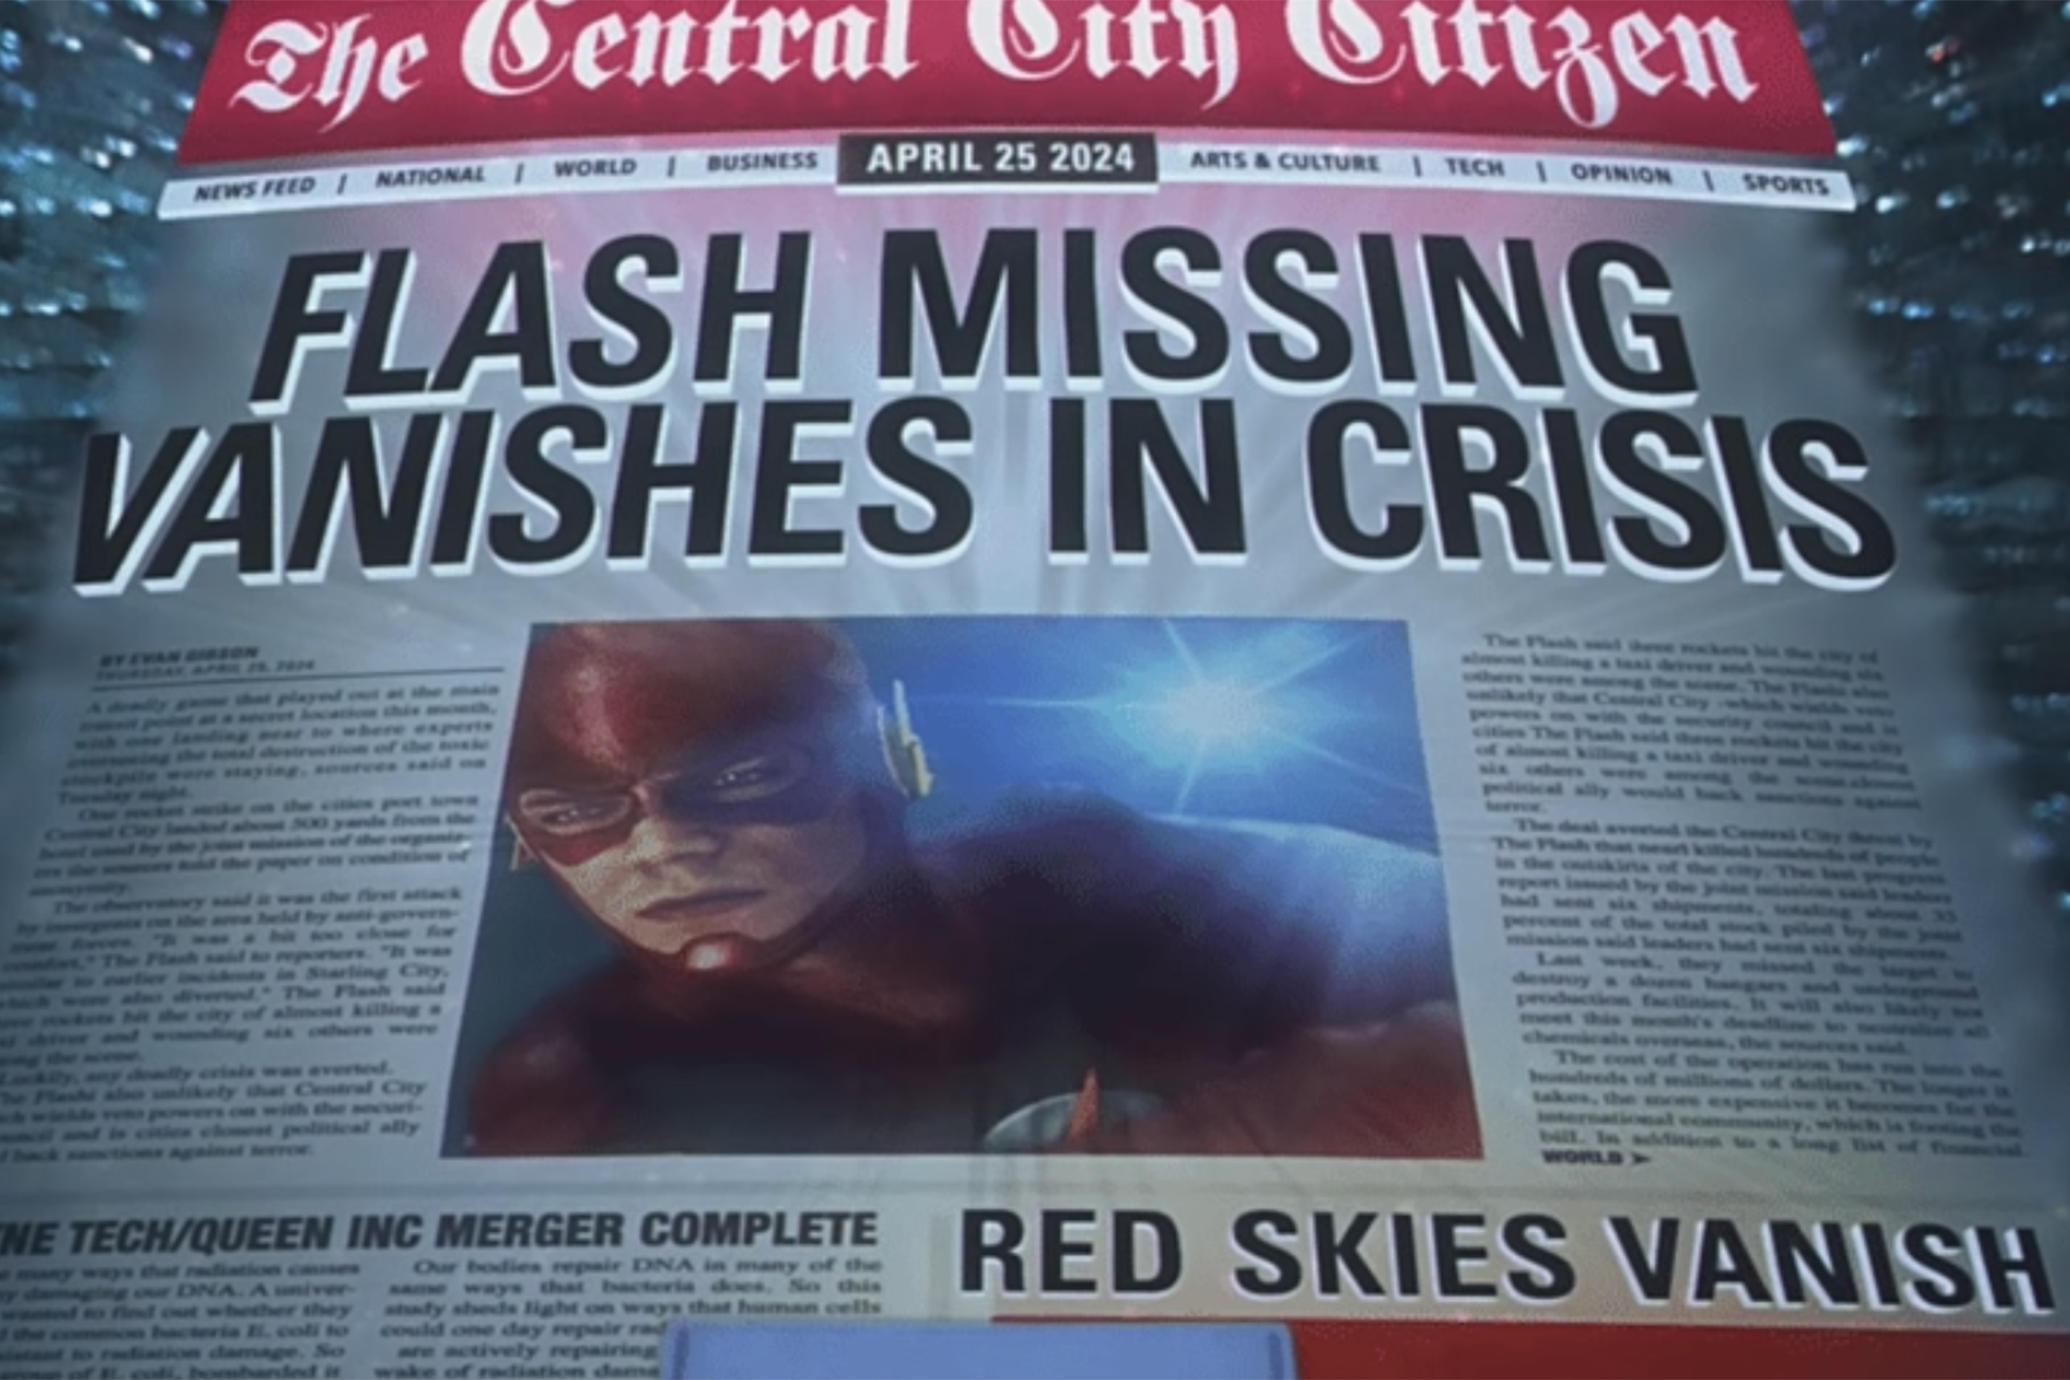 Vanishes in crisis